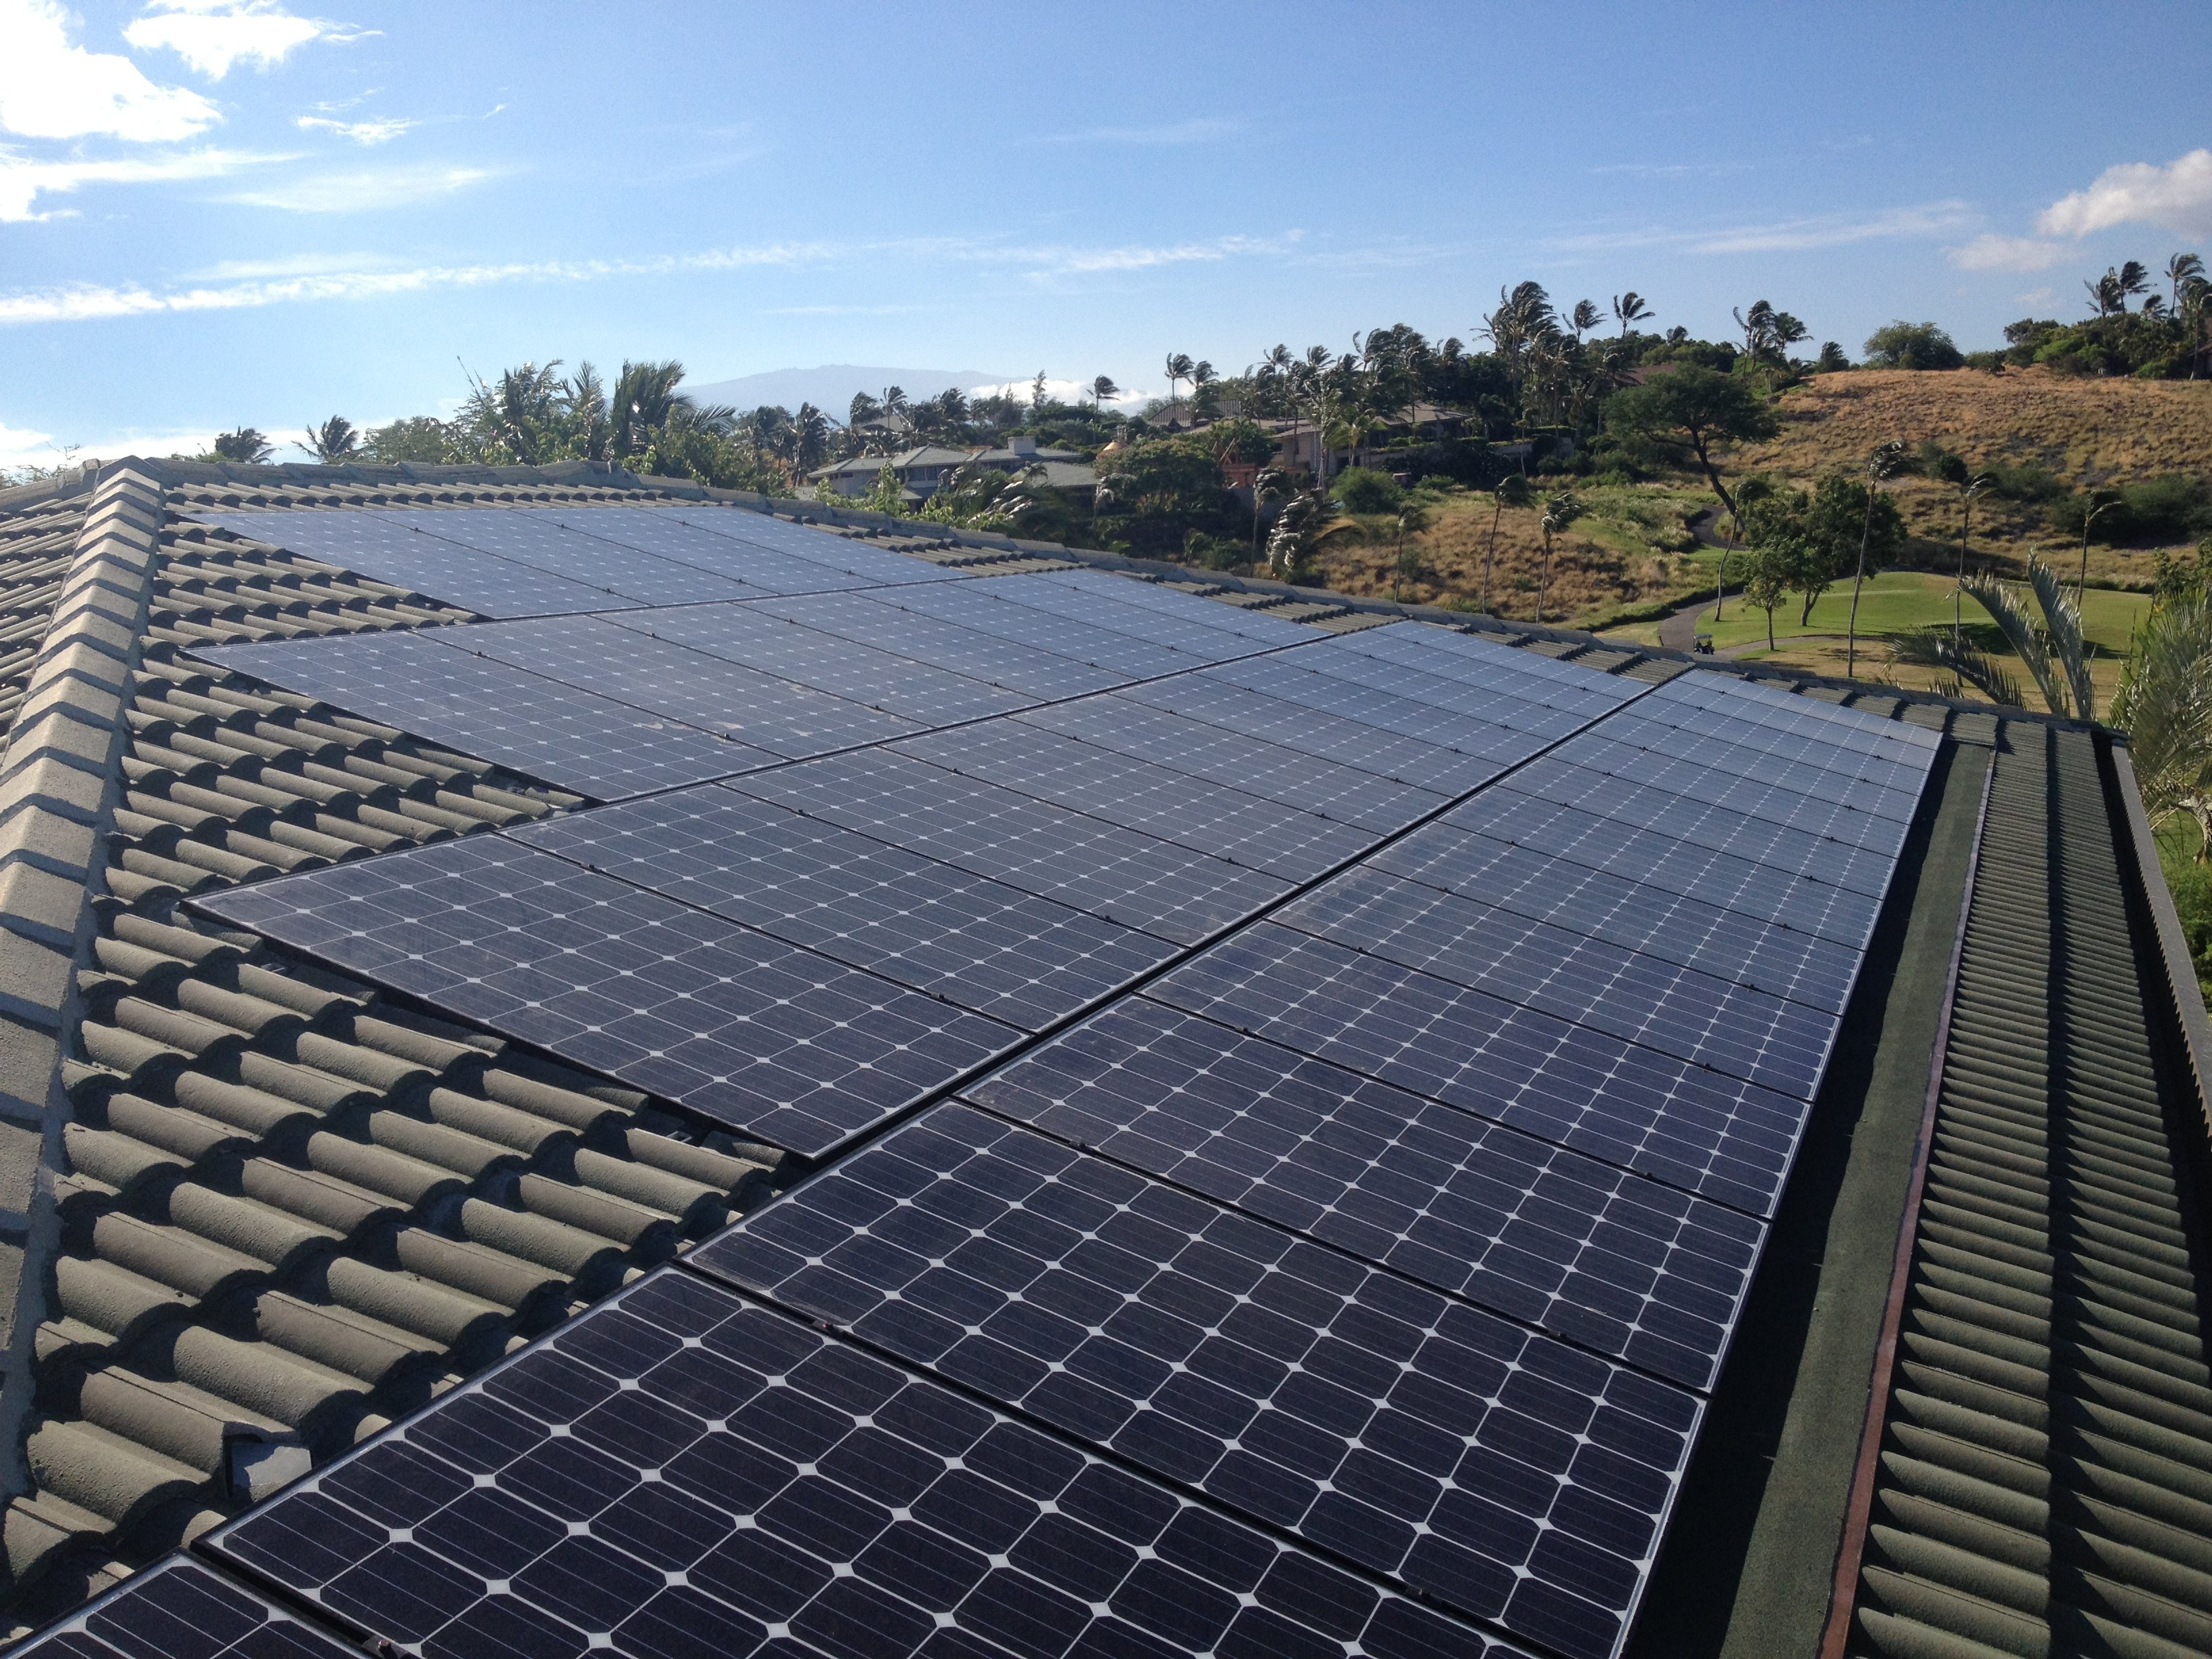 25 KW Solar PV system installed on rooftop in Honokaa, HI